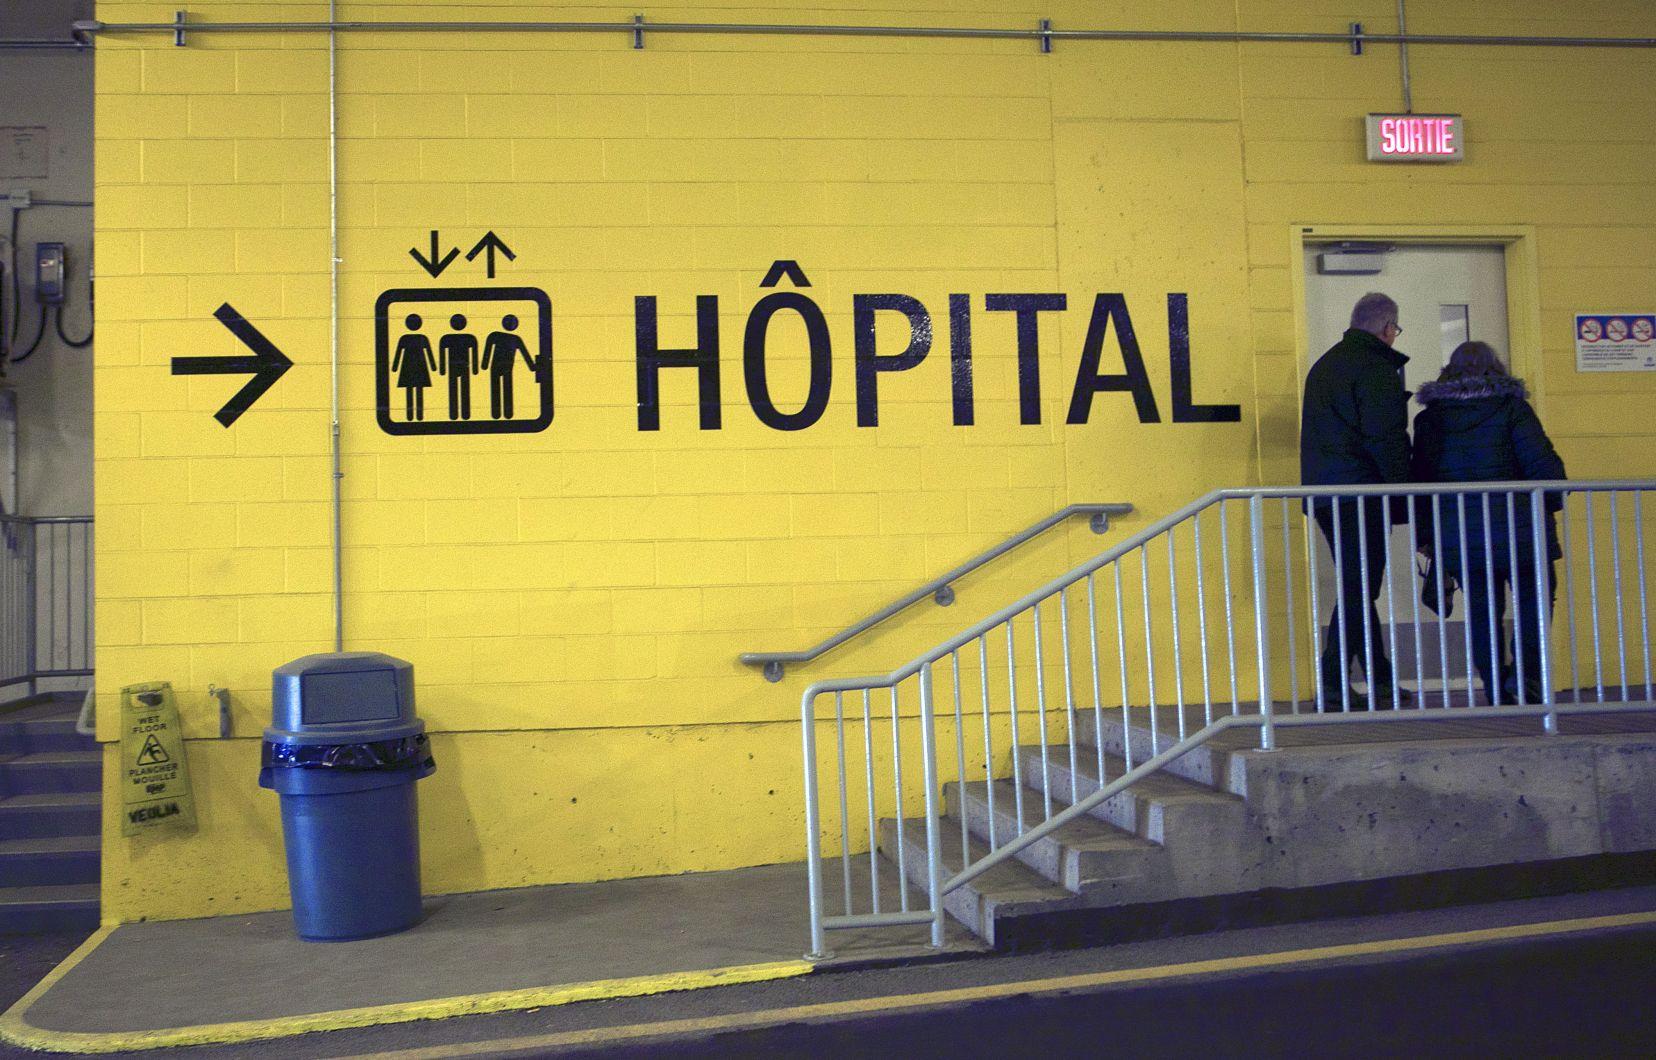 hopital stationnement philanthropie